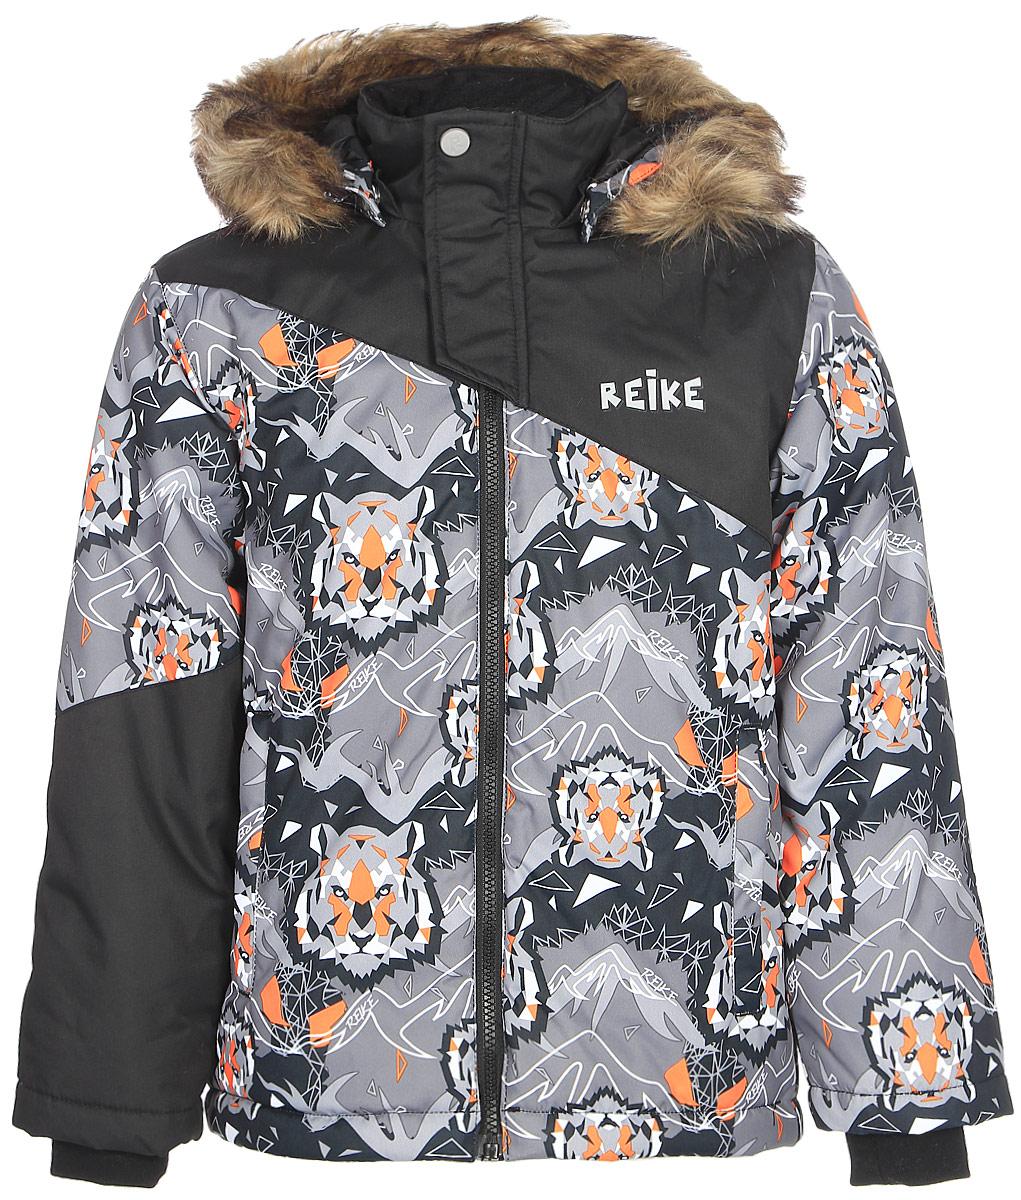 Куртка для мальчика Reike, цвет: серый. 3925510_TGR grey. Размер 1403925510_TGR grey